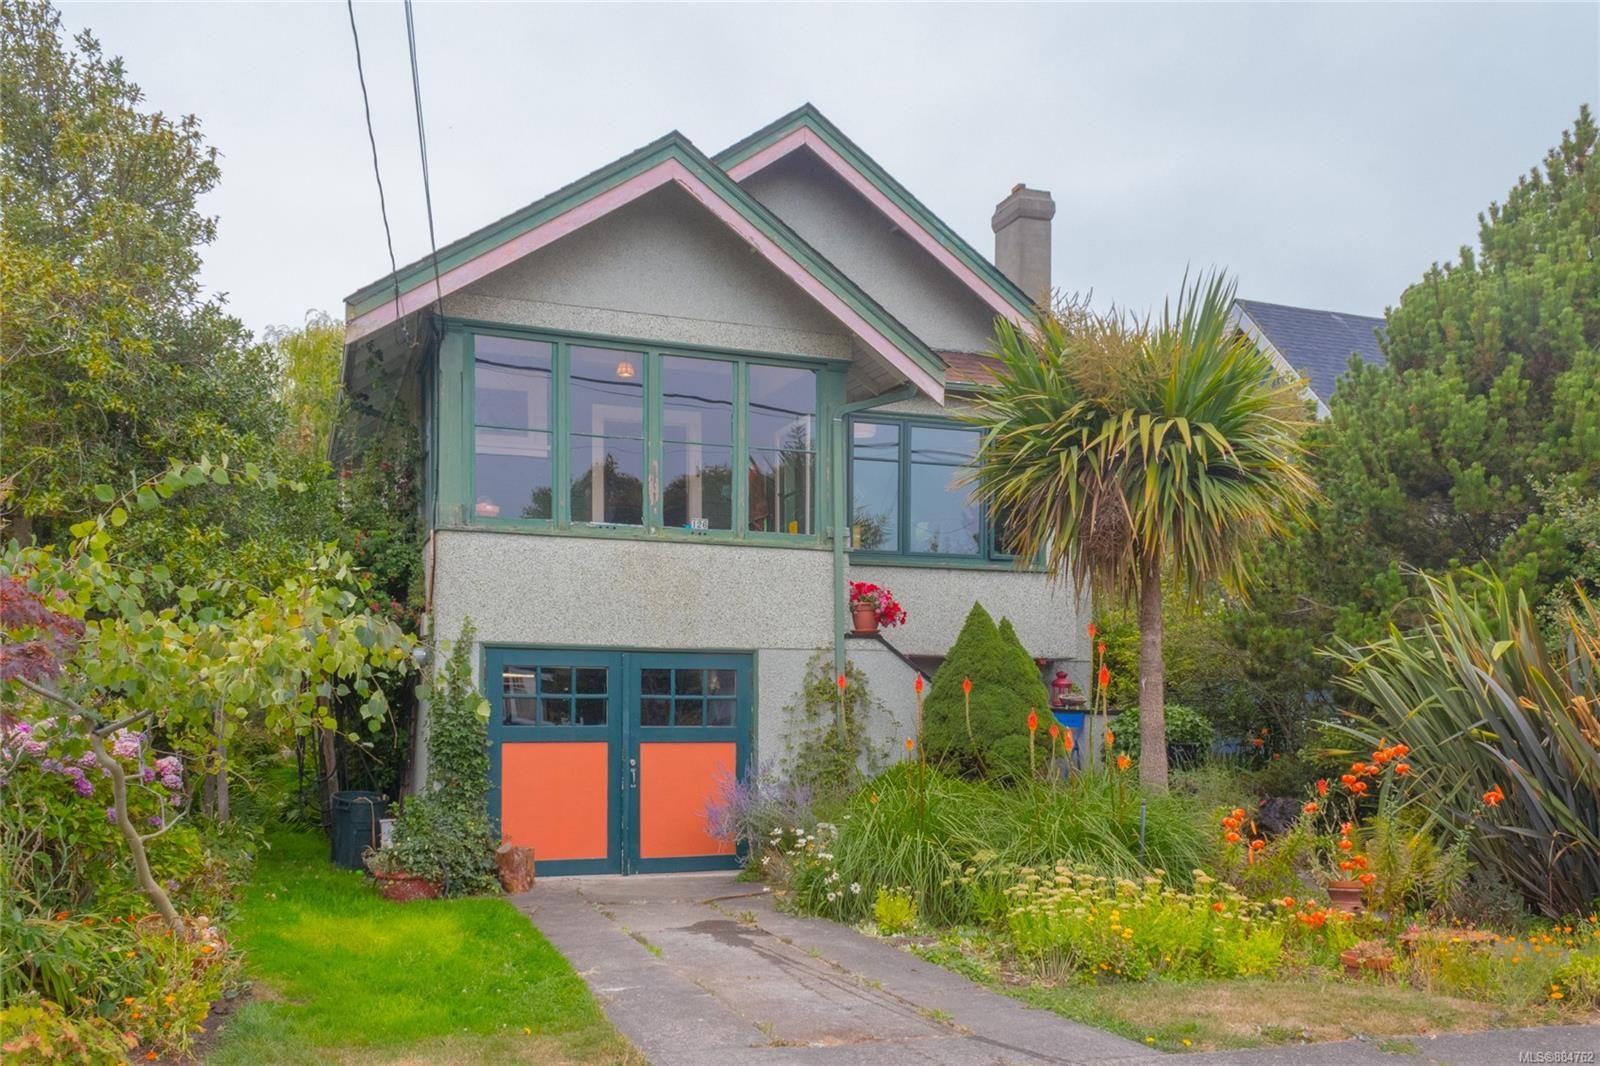 Main Photo: 126 Joseph St in : Vi Fairfield East House for sale (Victoria)  : MLS®# 884762